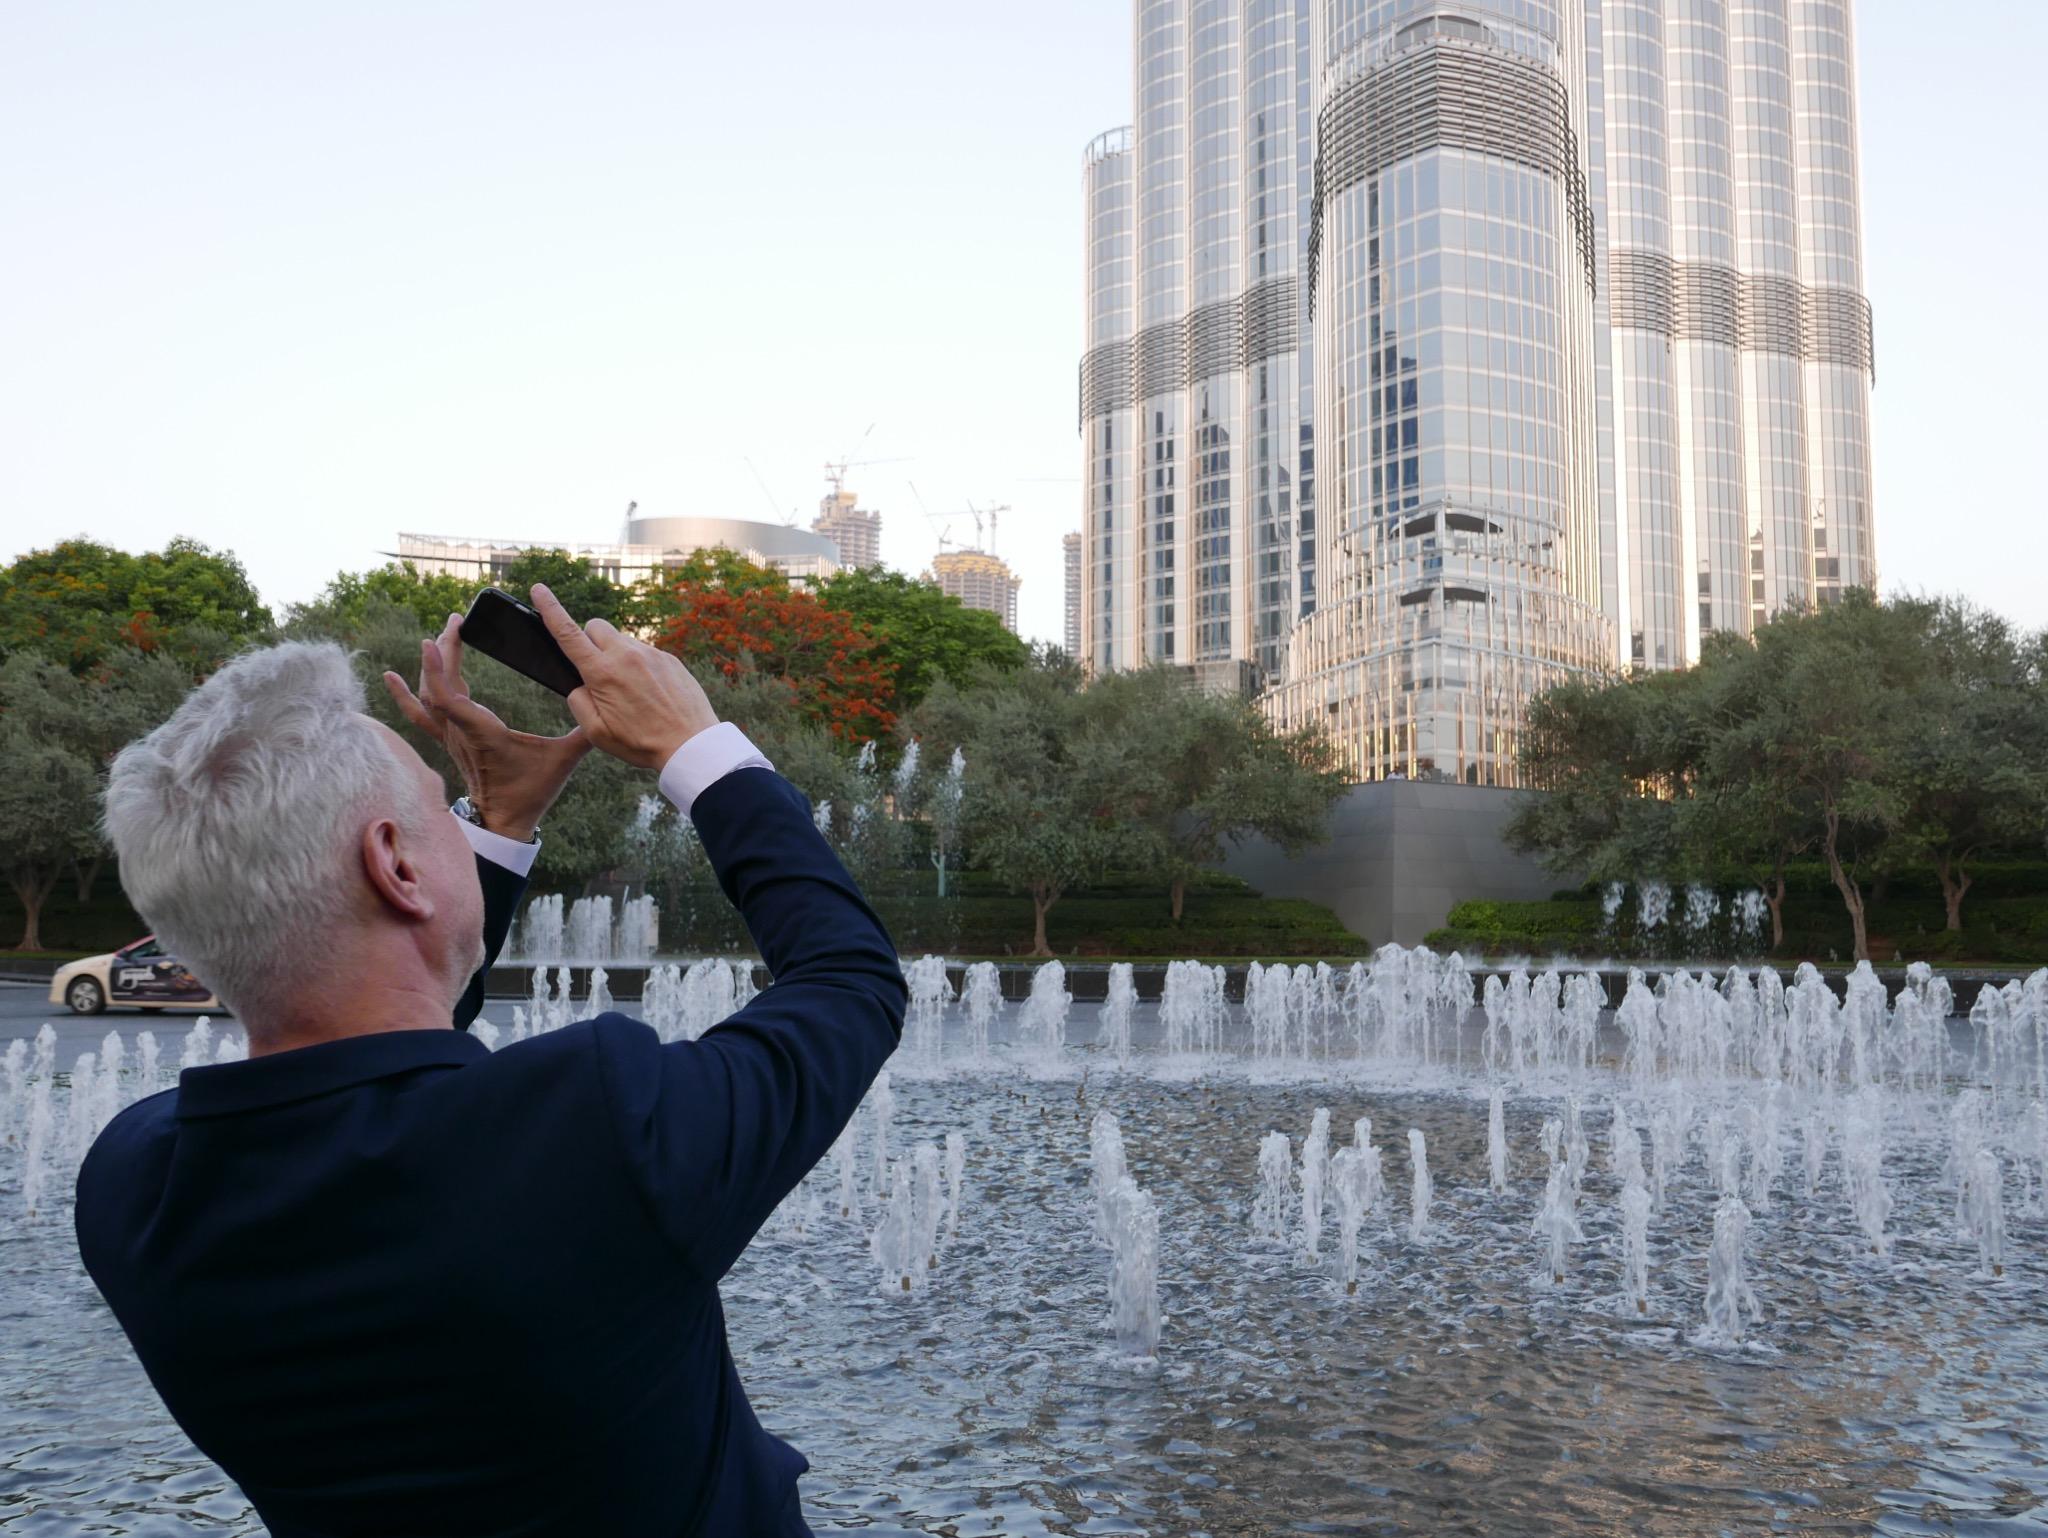 Roland snaps of photo of the Burj Khalifa